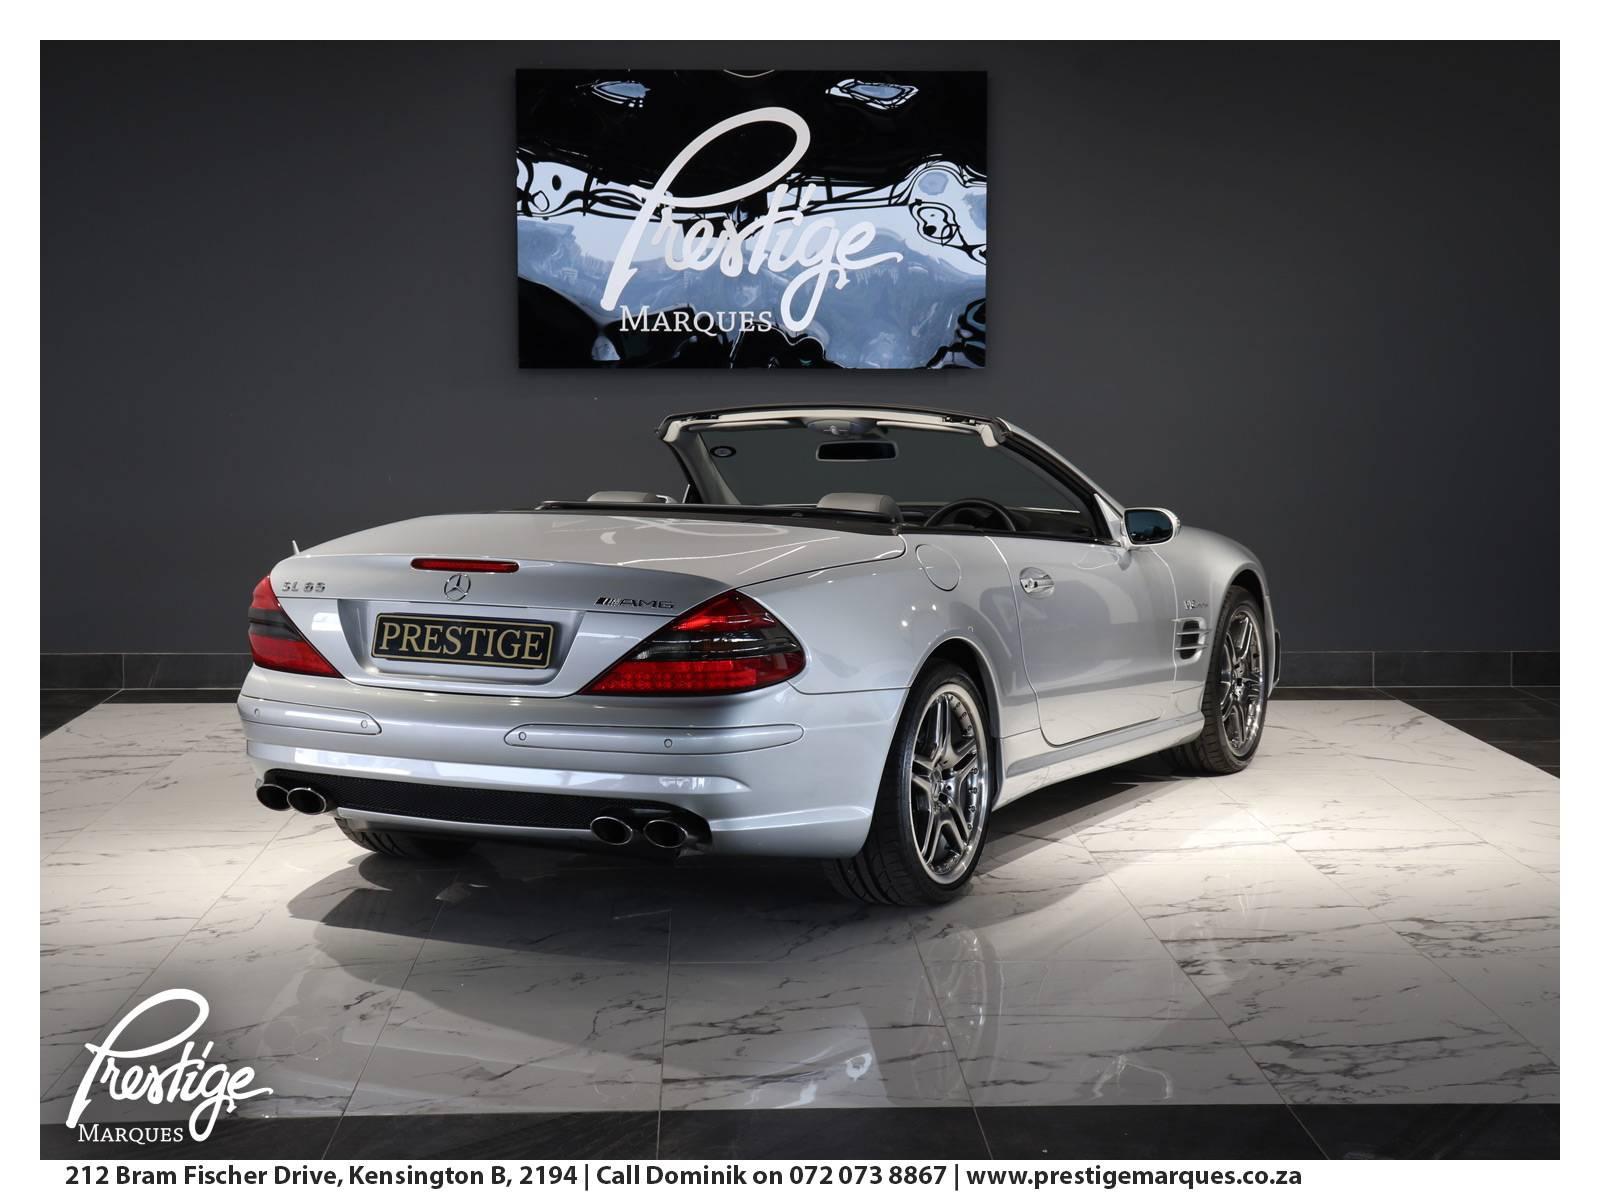 2006-Mercedes-Benz-SL65-AMG-Prestige-Marques-Randburg-Sandton-5